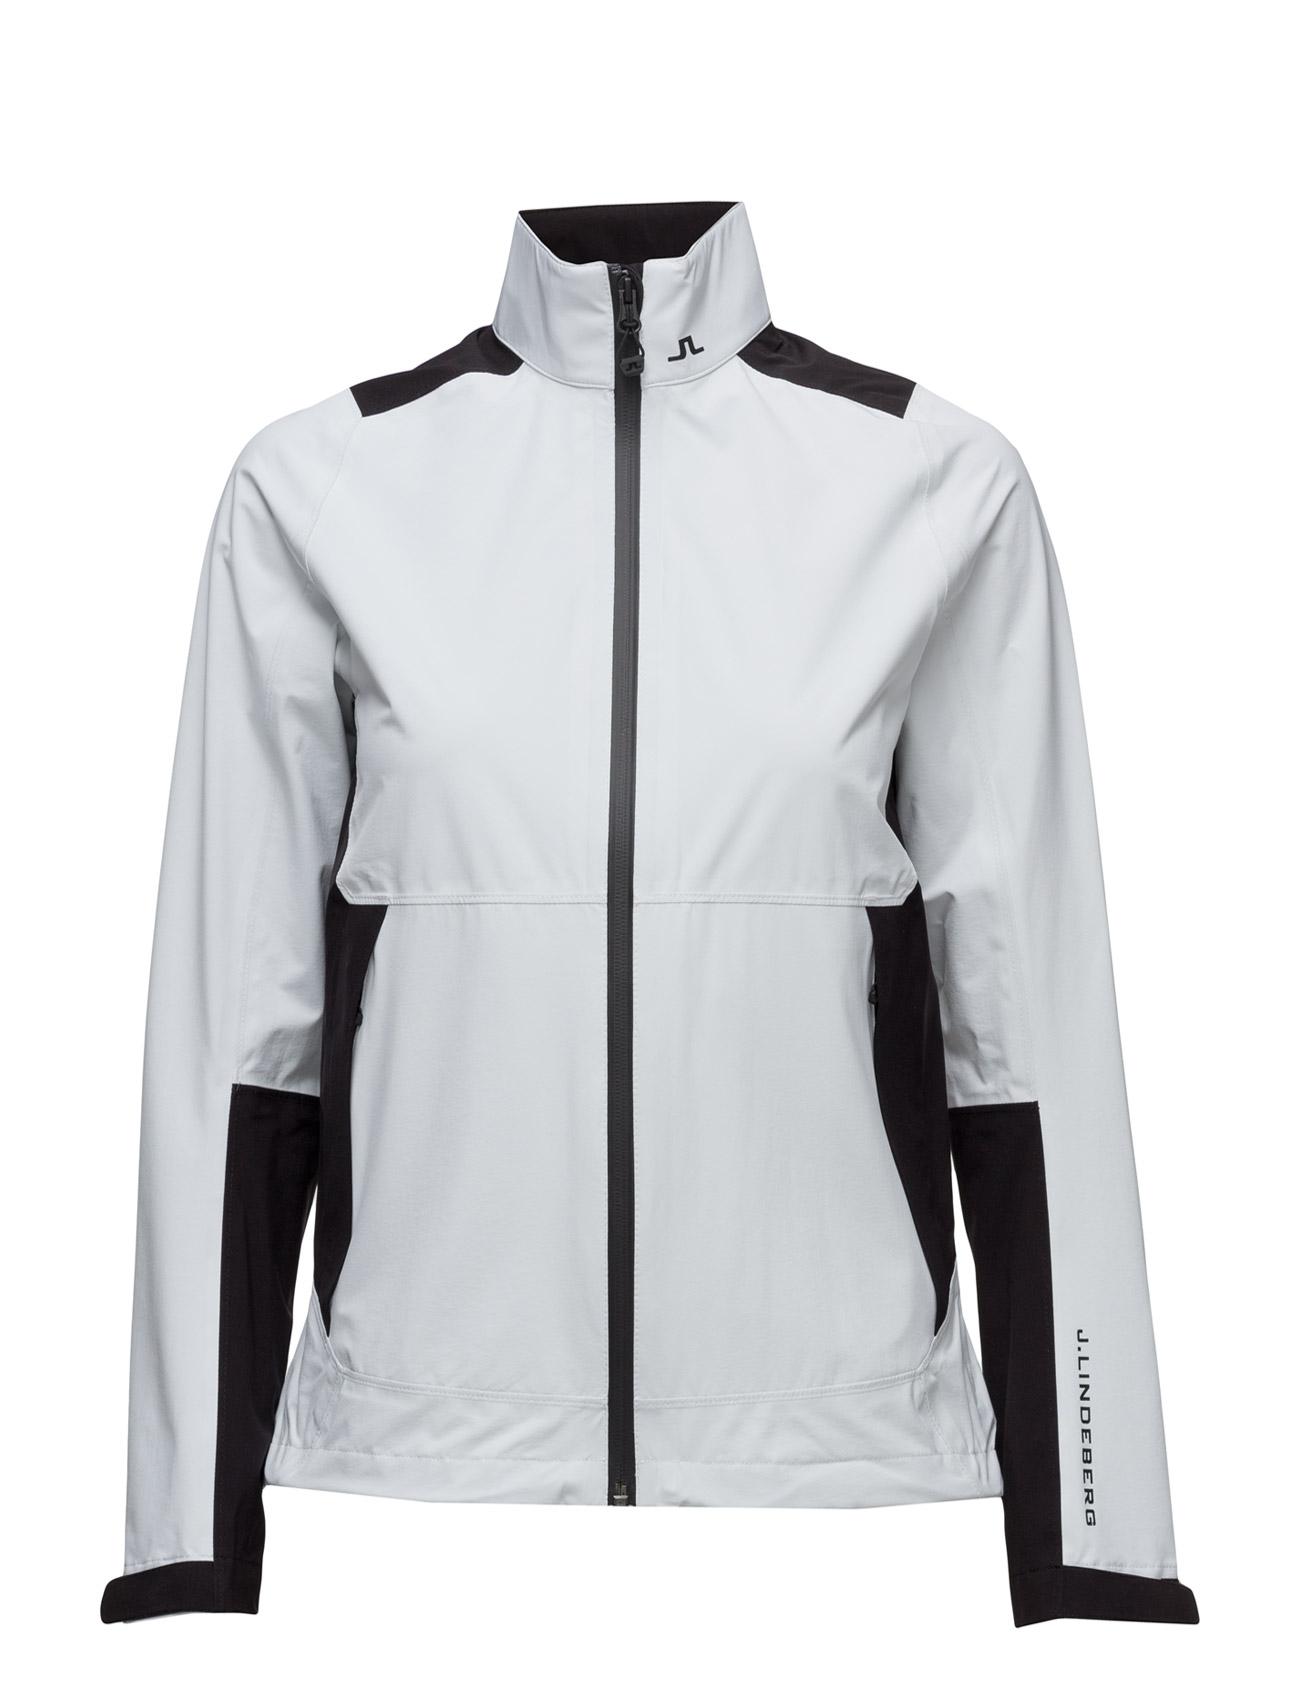 W Drive Jkt 2,5-Ply J. Lindeberg Golf Sportsjakker til Unisex i hvid